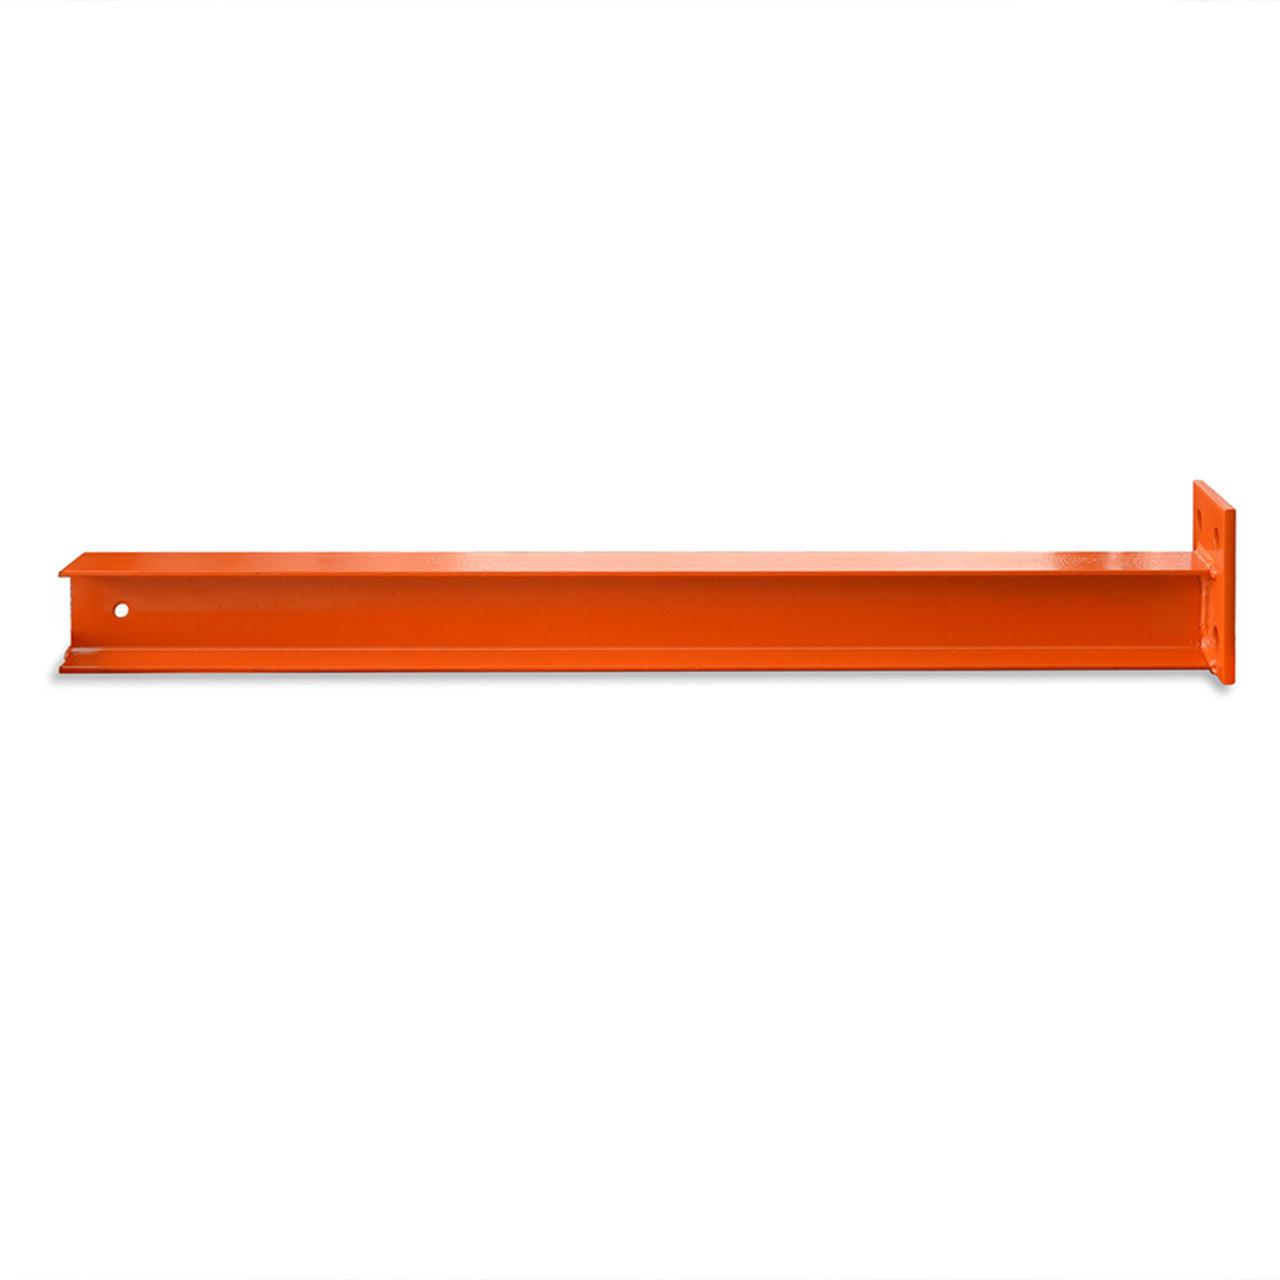 Cantilever rack arm